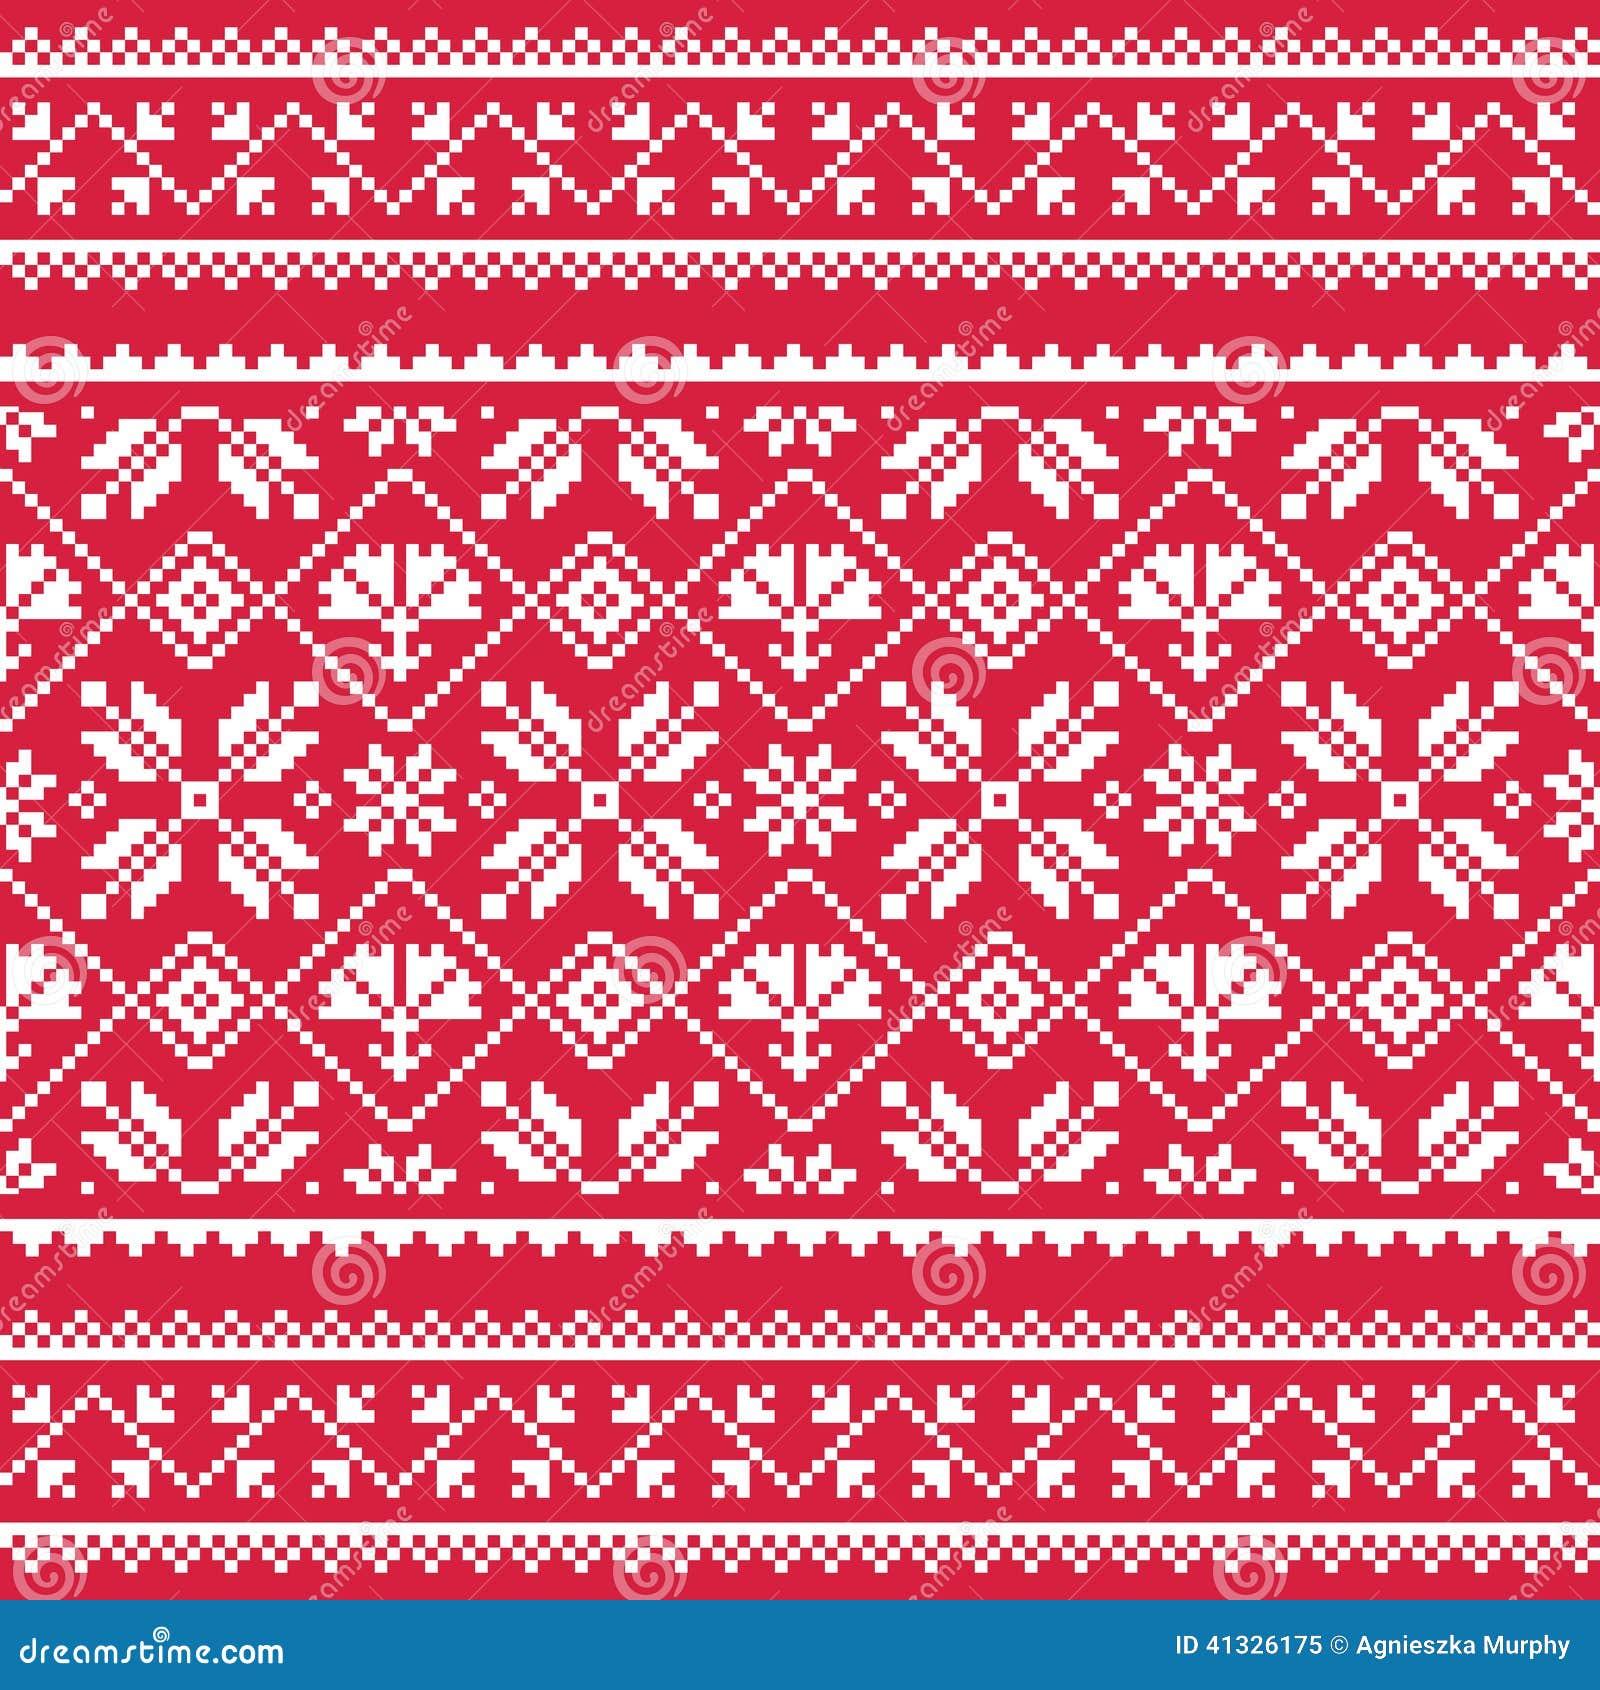 Ukrainian Slavic Folk Art White Embroidery Pattern On Red